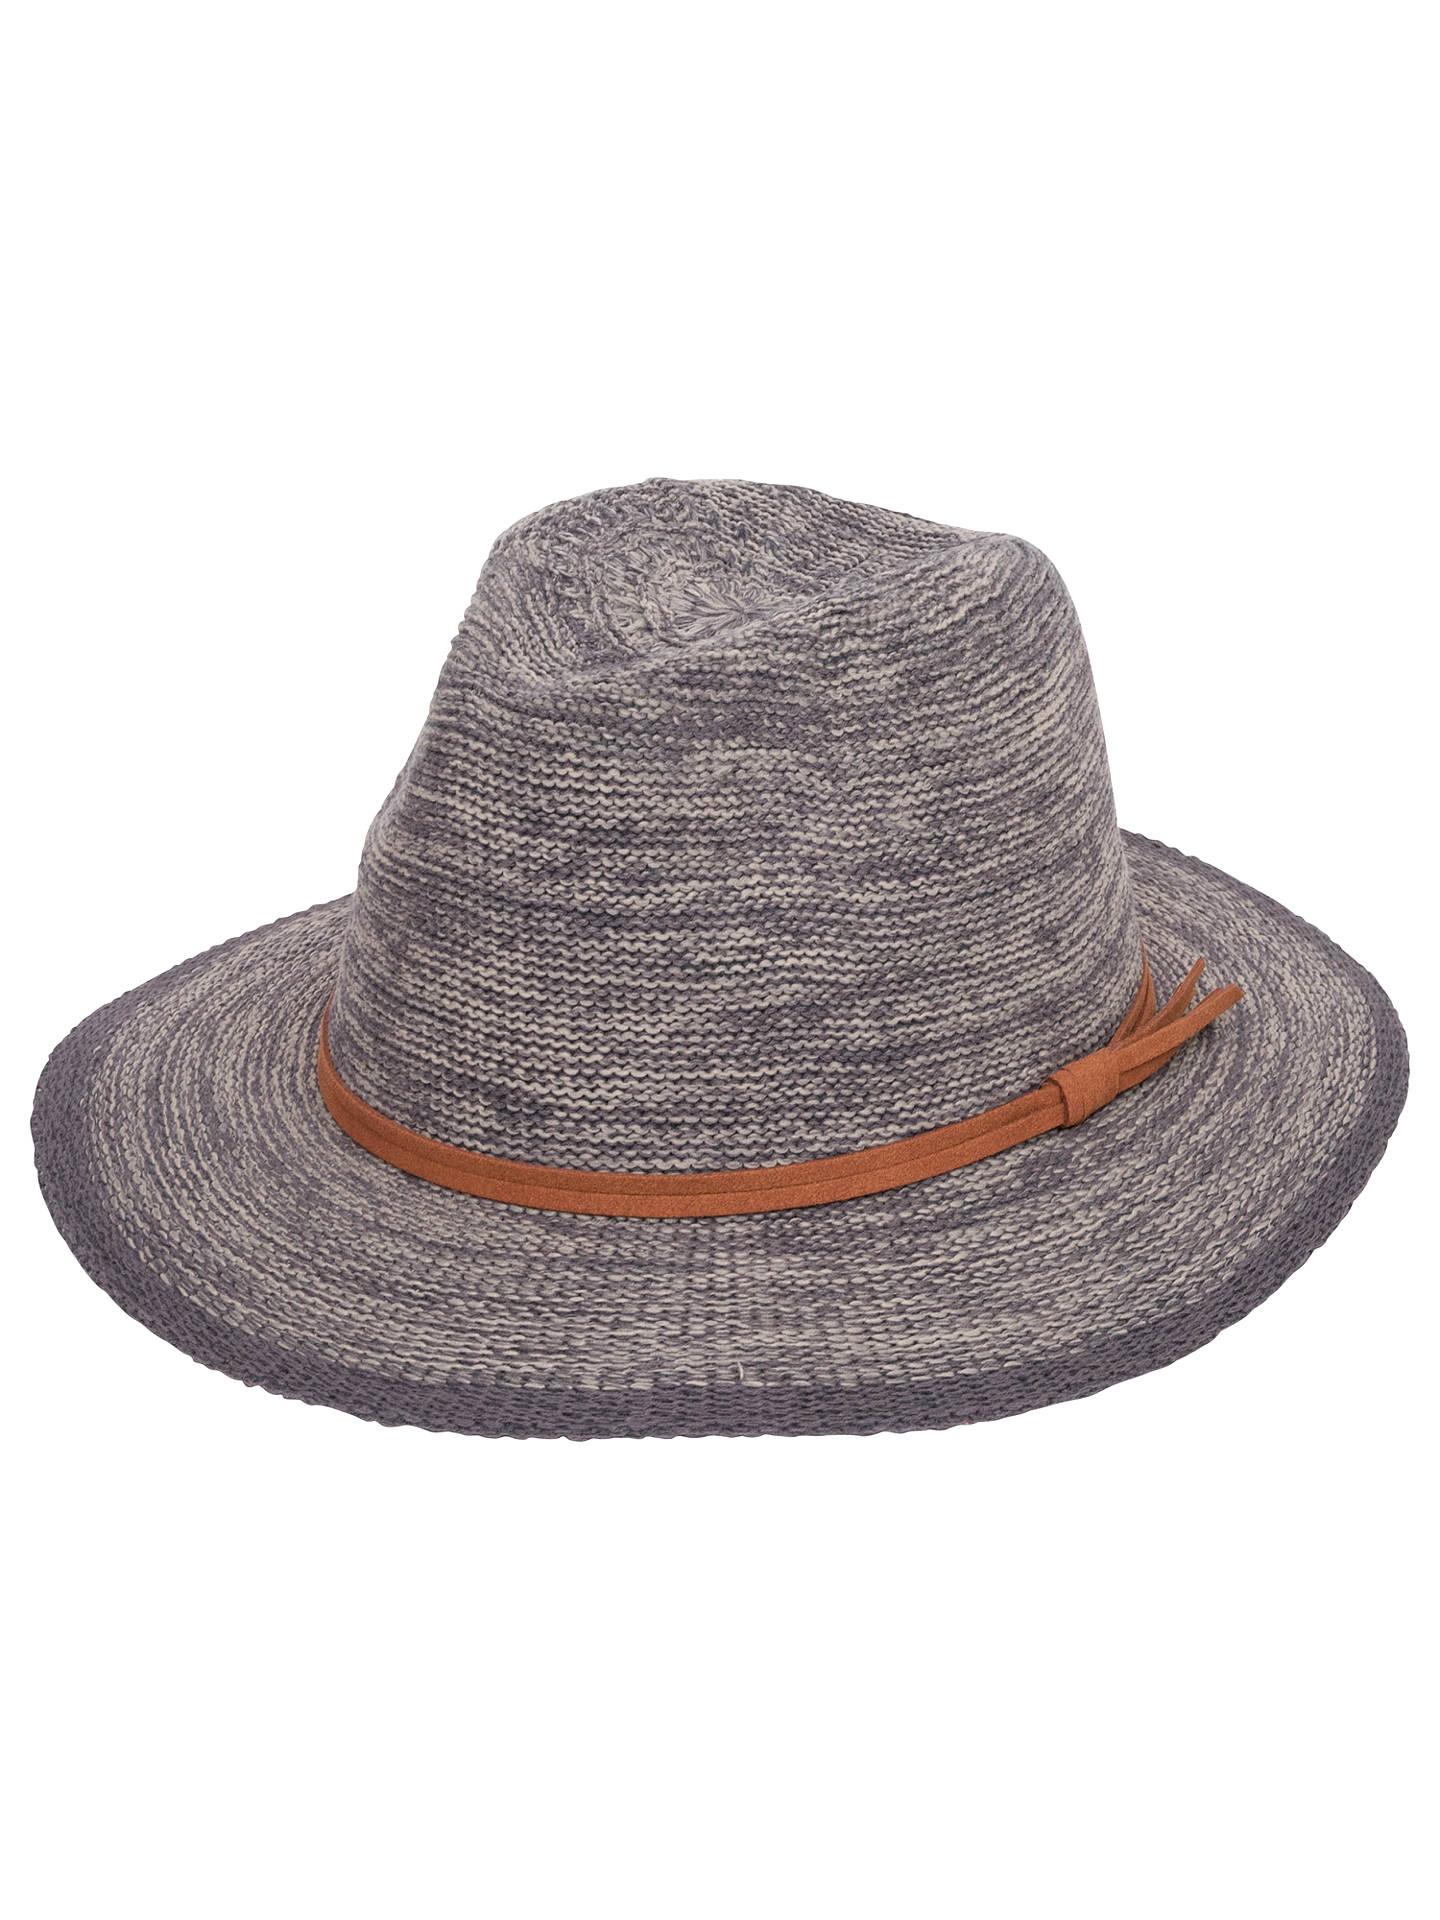 Powder Natalie Fedora Hat at John Lewis   Partners 679012f03574